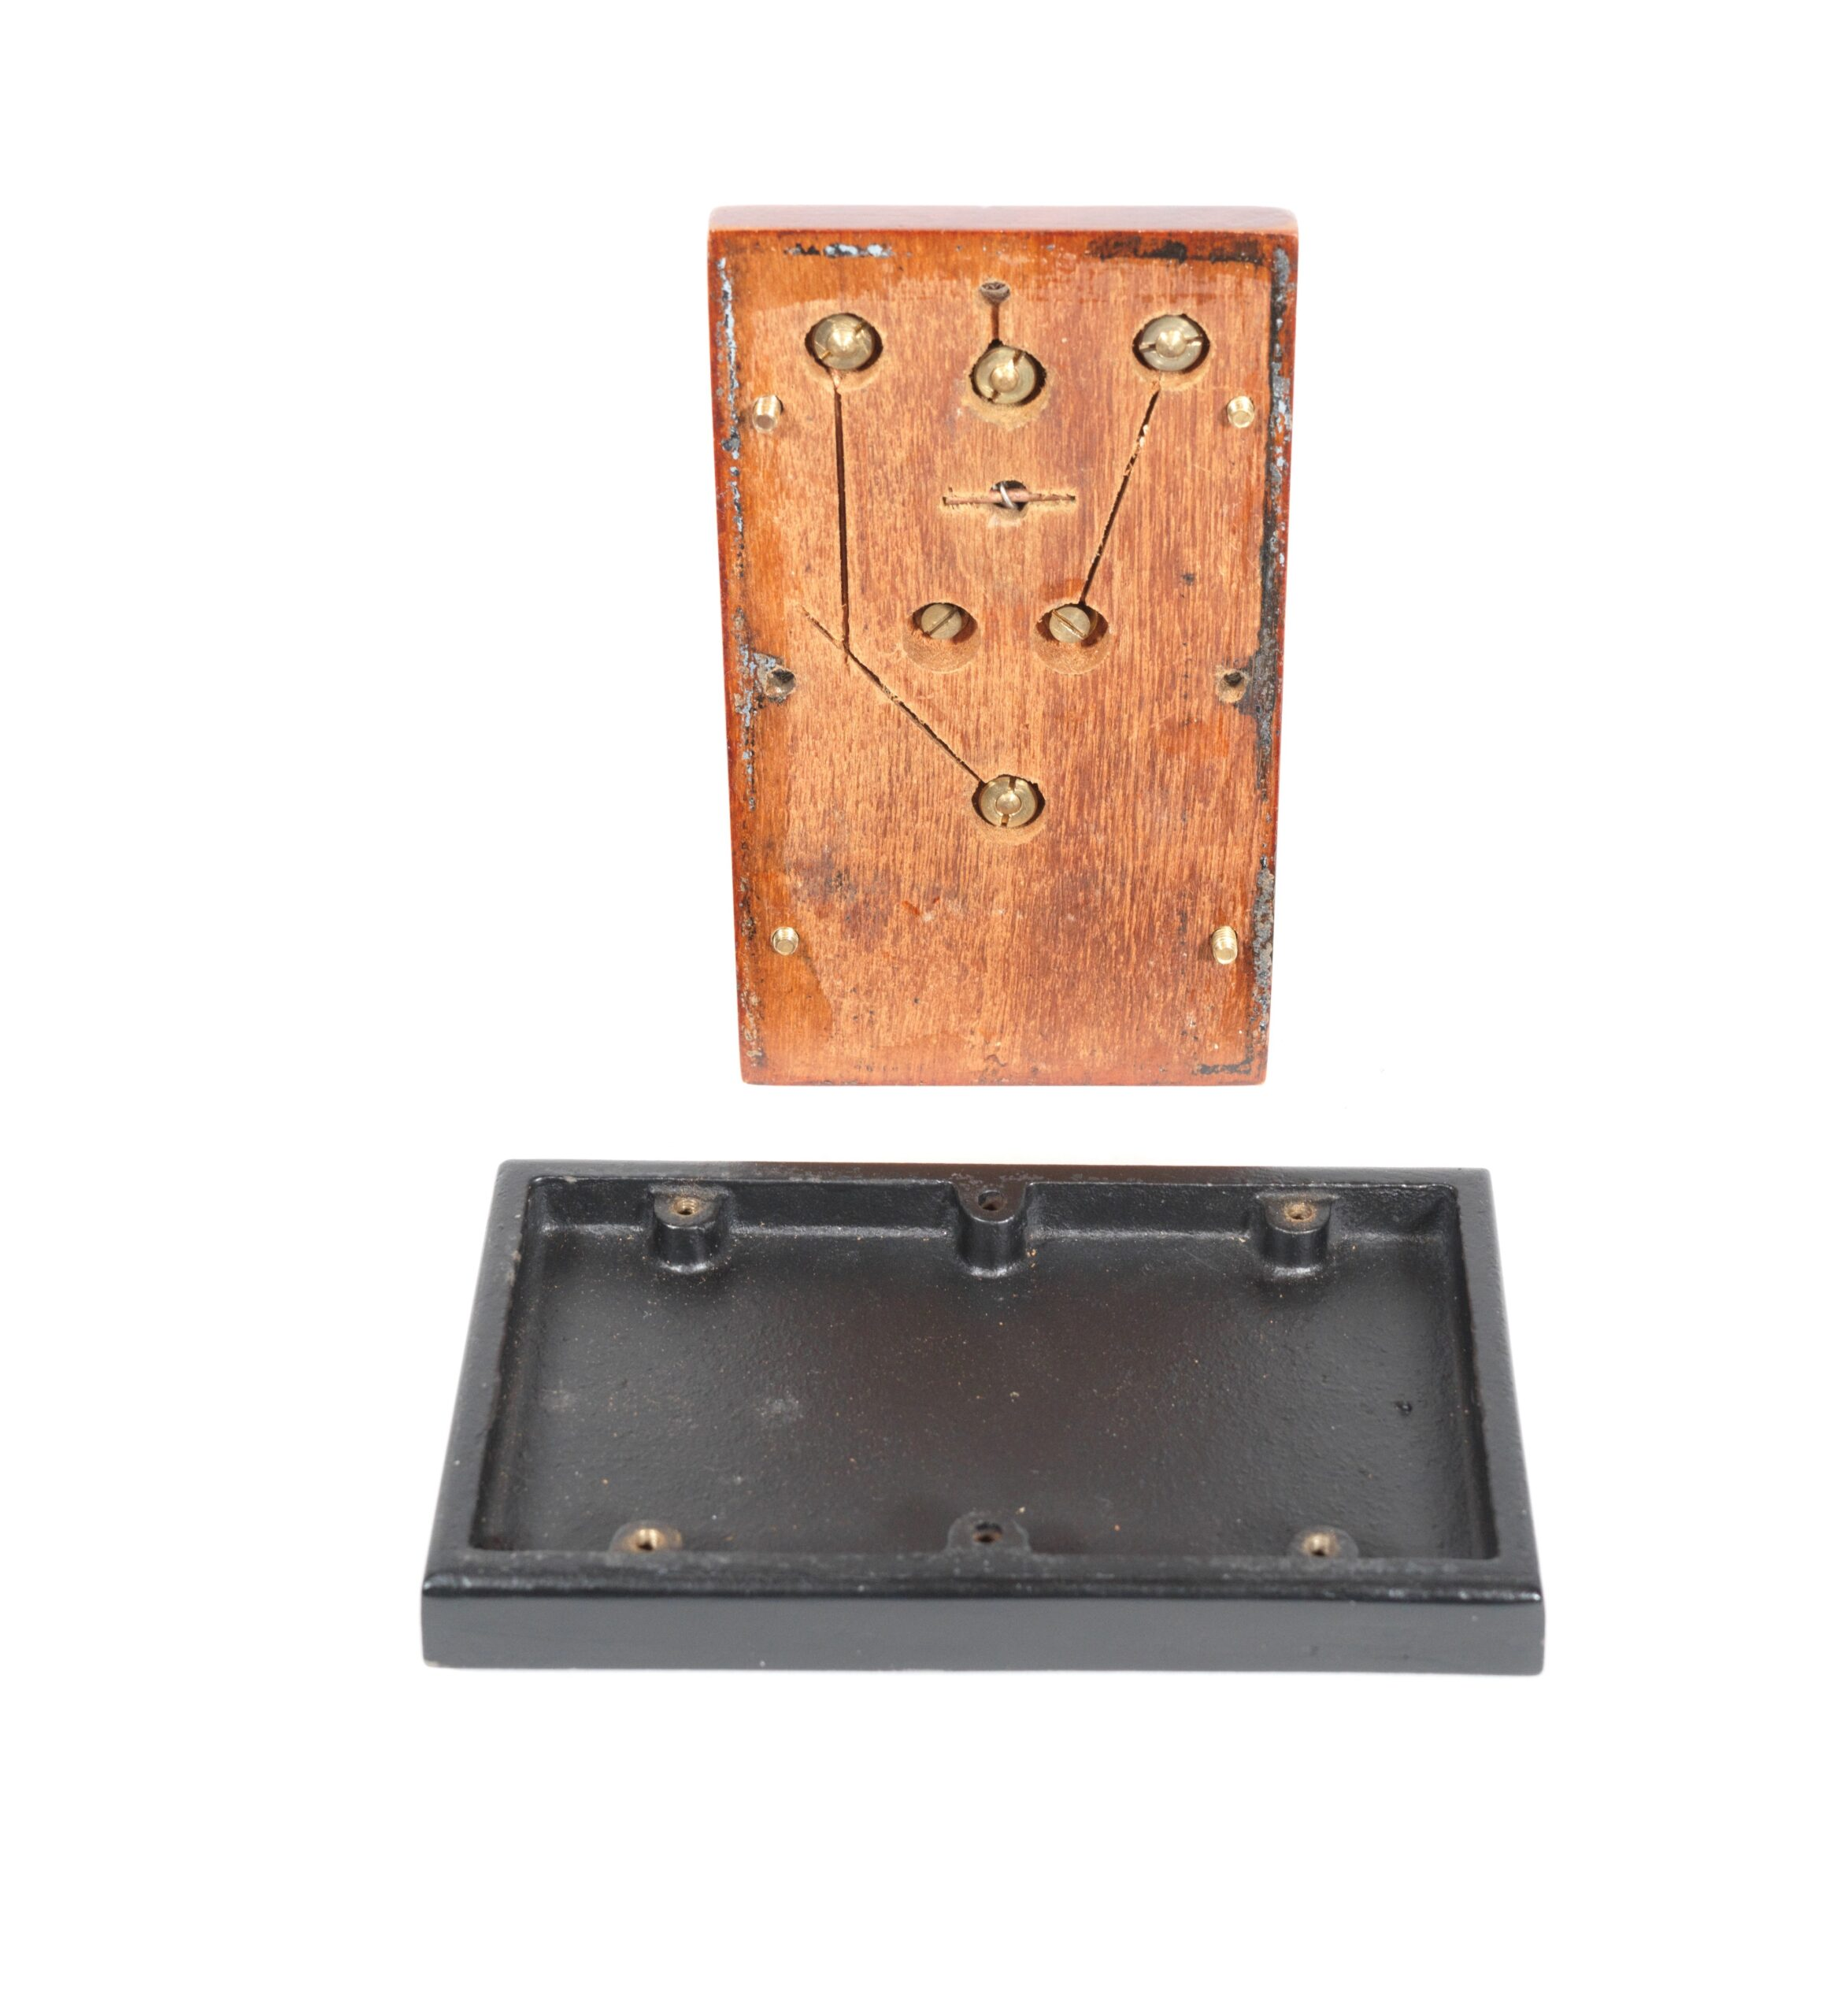 Marconi Spark Key